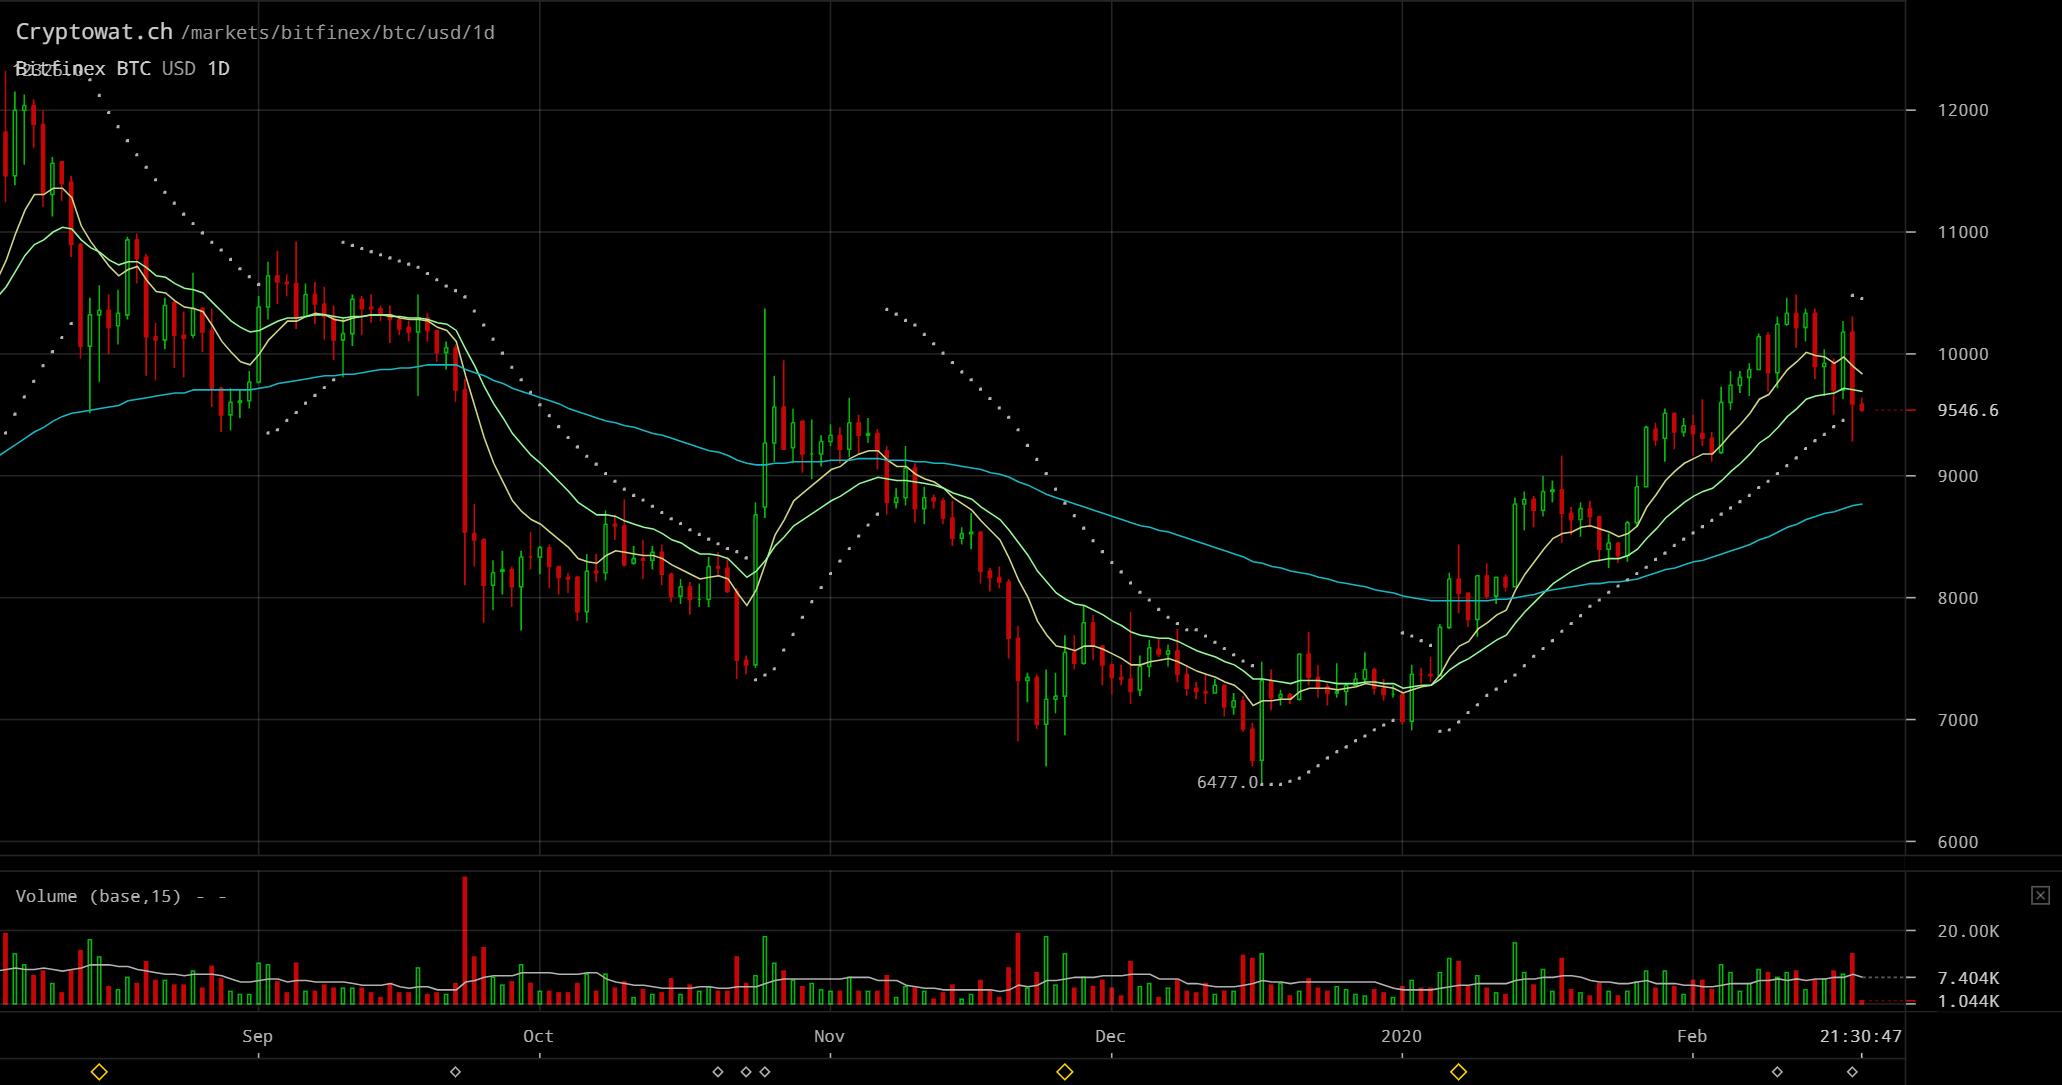 bitfinex bitcoin chart daily(비트파이넥스 비트코인 일봉 2020년2월)